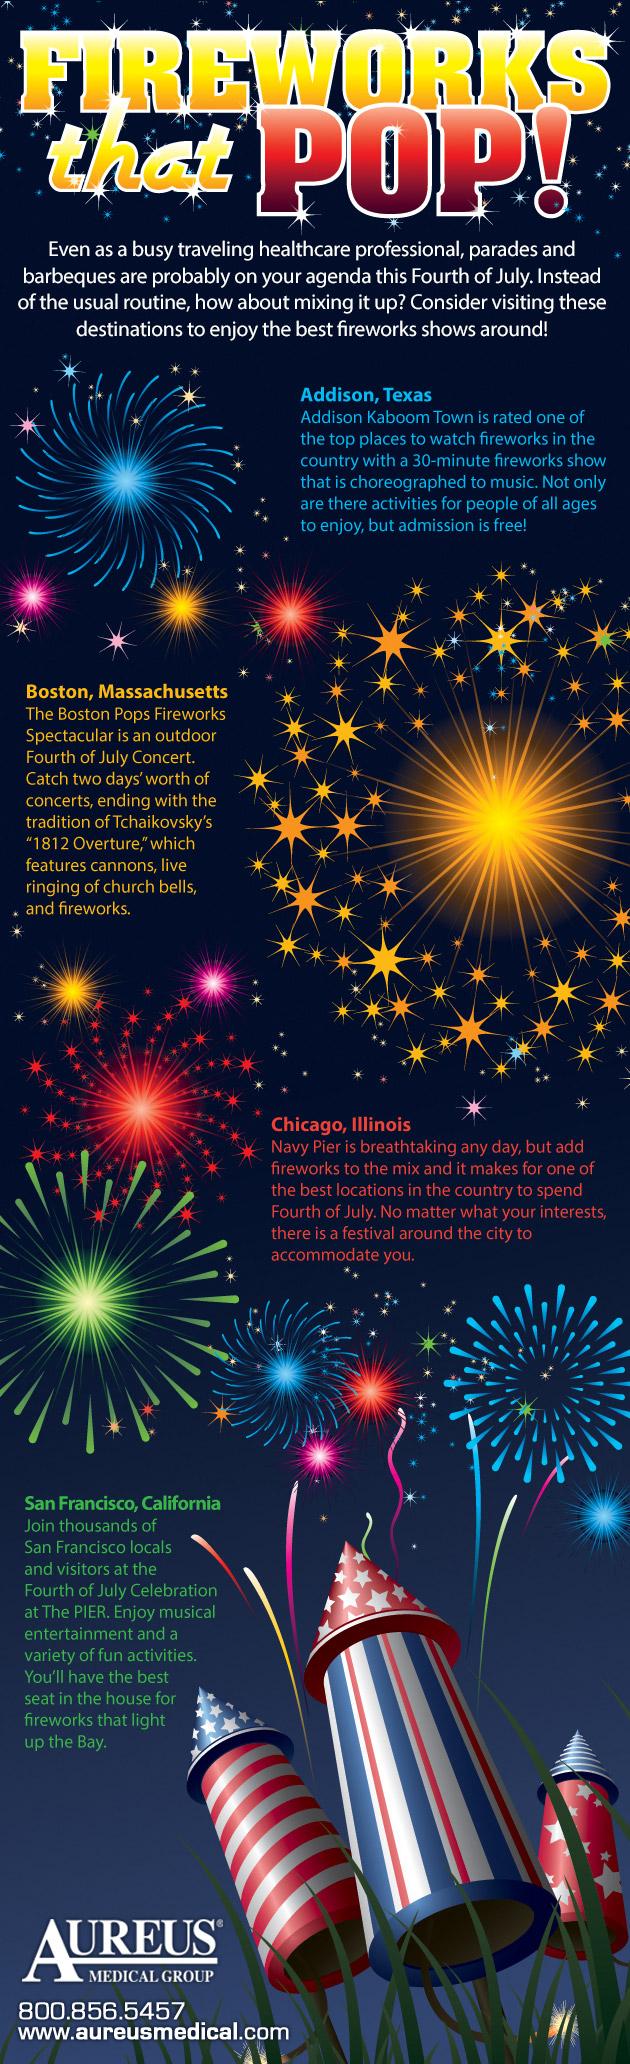 Fireworks that Pop!